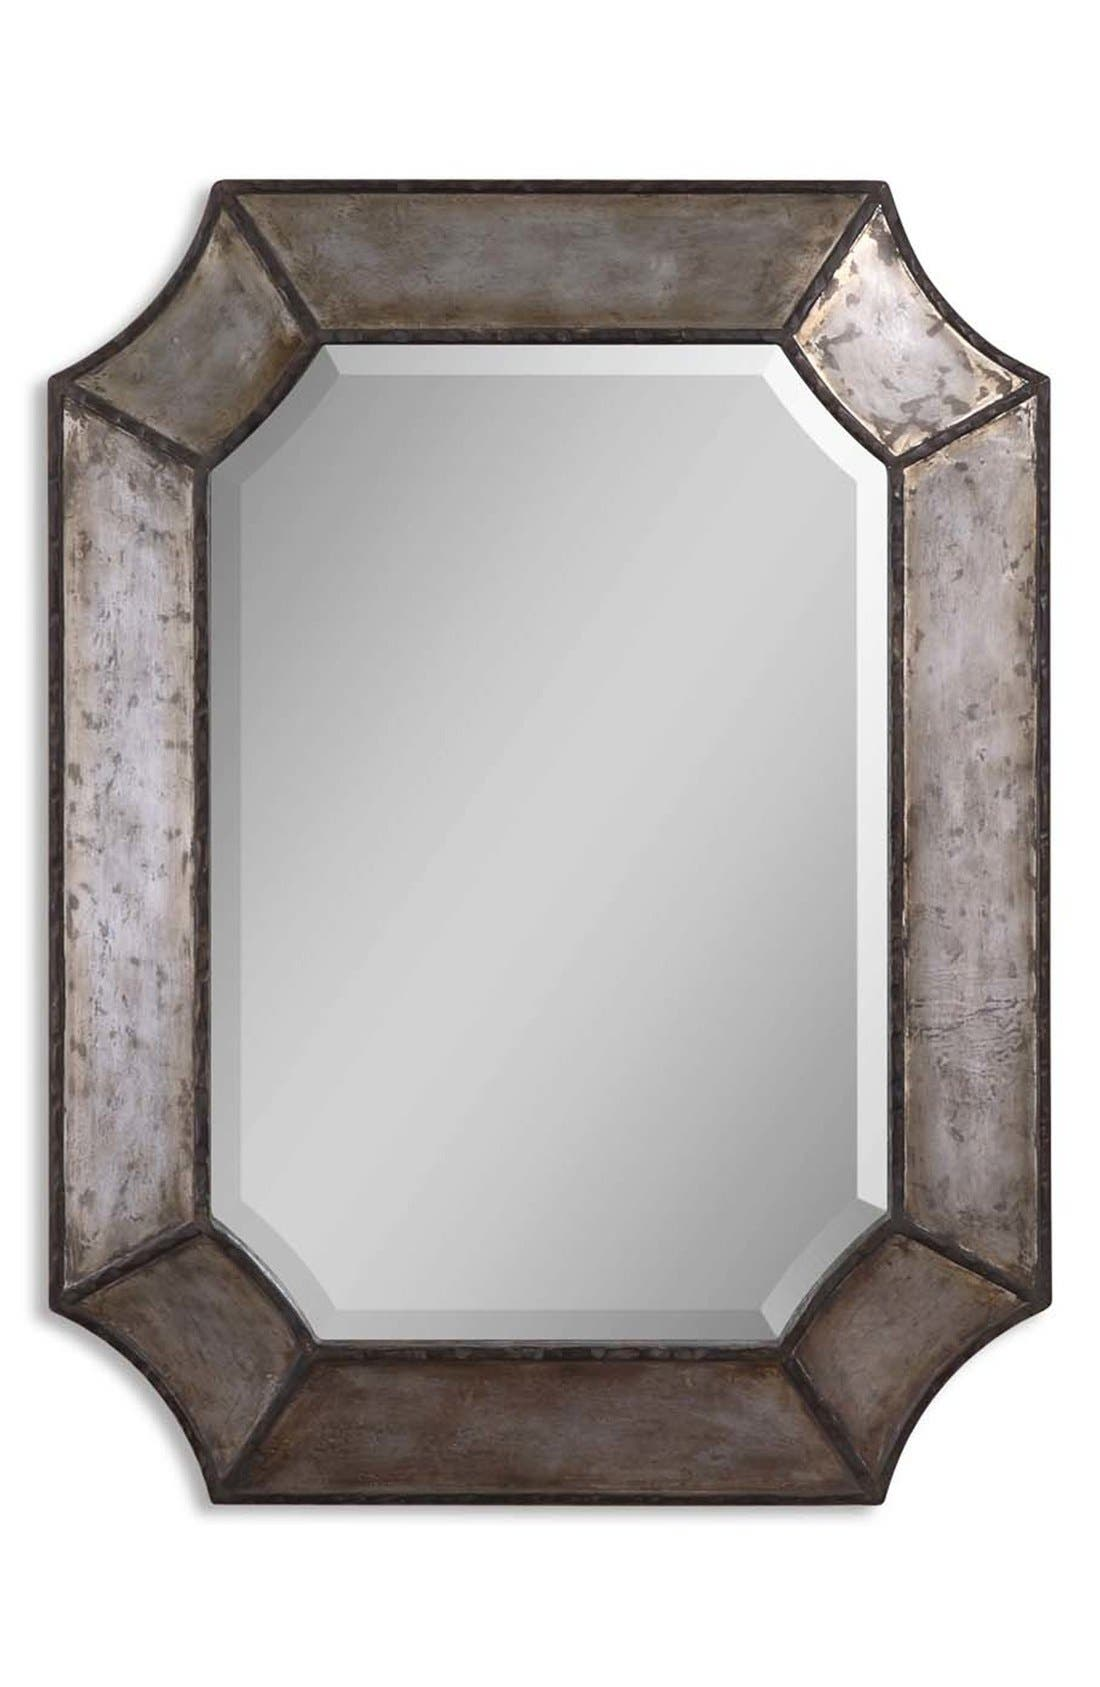 Main Image - Uttermost 'Elliot' Distressed Mirror